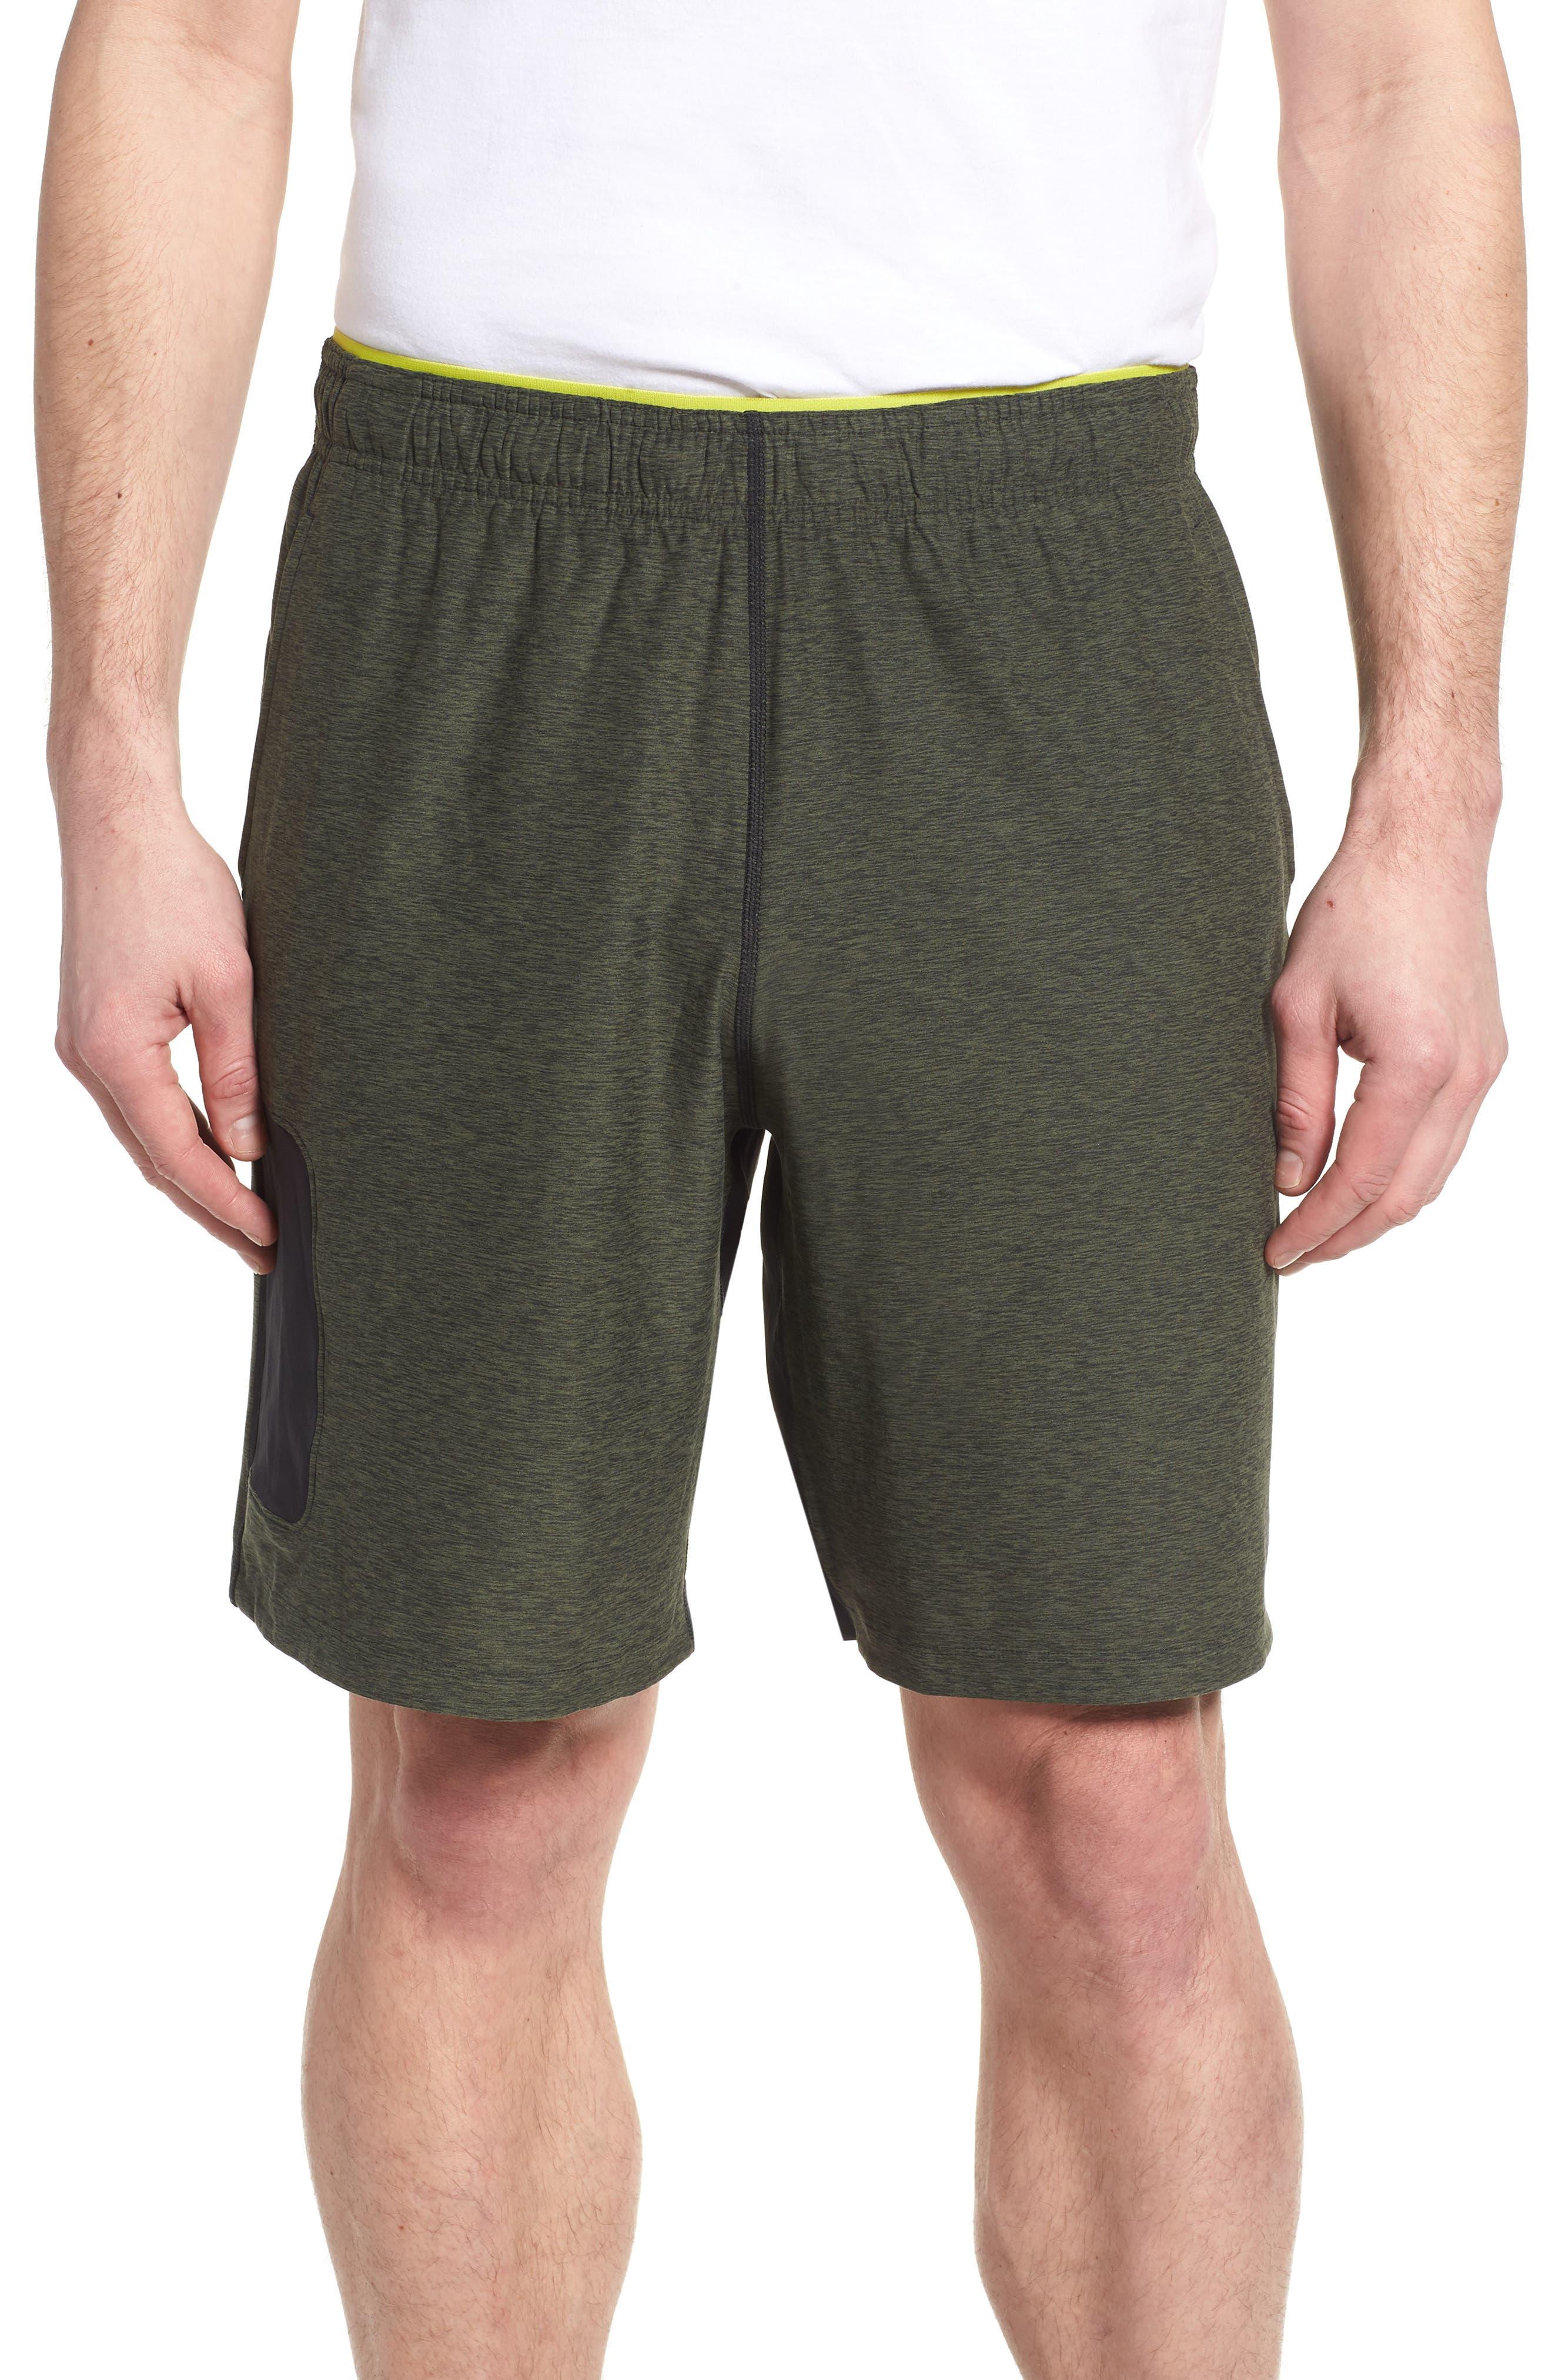 Anticipate Shorts,                             Main thumbnail 1, color,                             Dark Covert Green